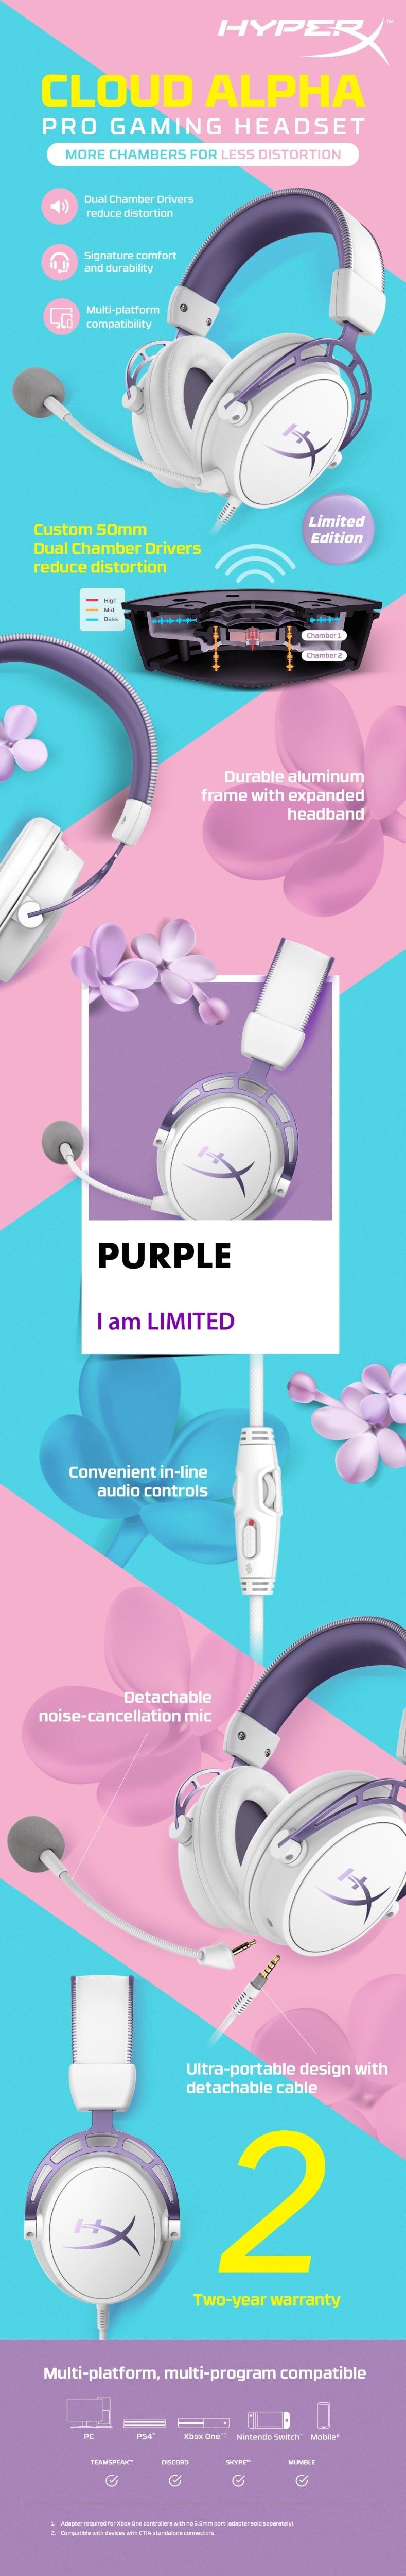 _APAC_ Cloud Alpha - Purple edition_Etail banner_EN_Etail banner_ Cloud Alpha - Purple edition_EN_08_04_2019 03_04